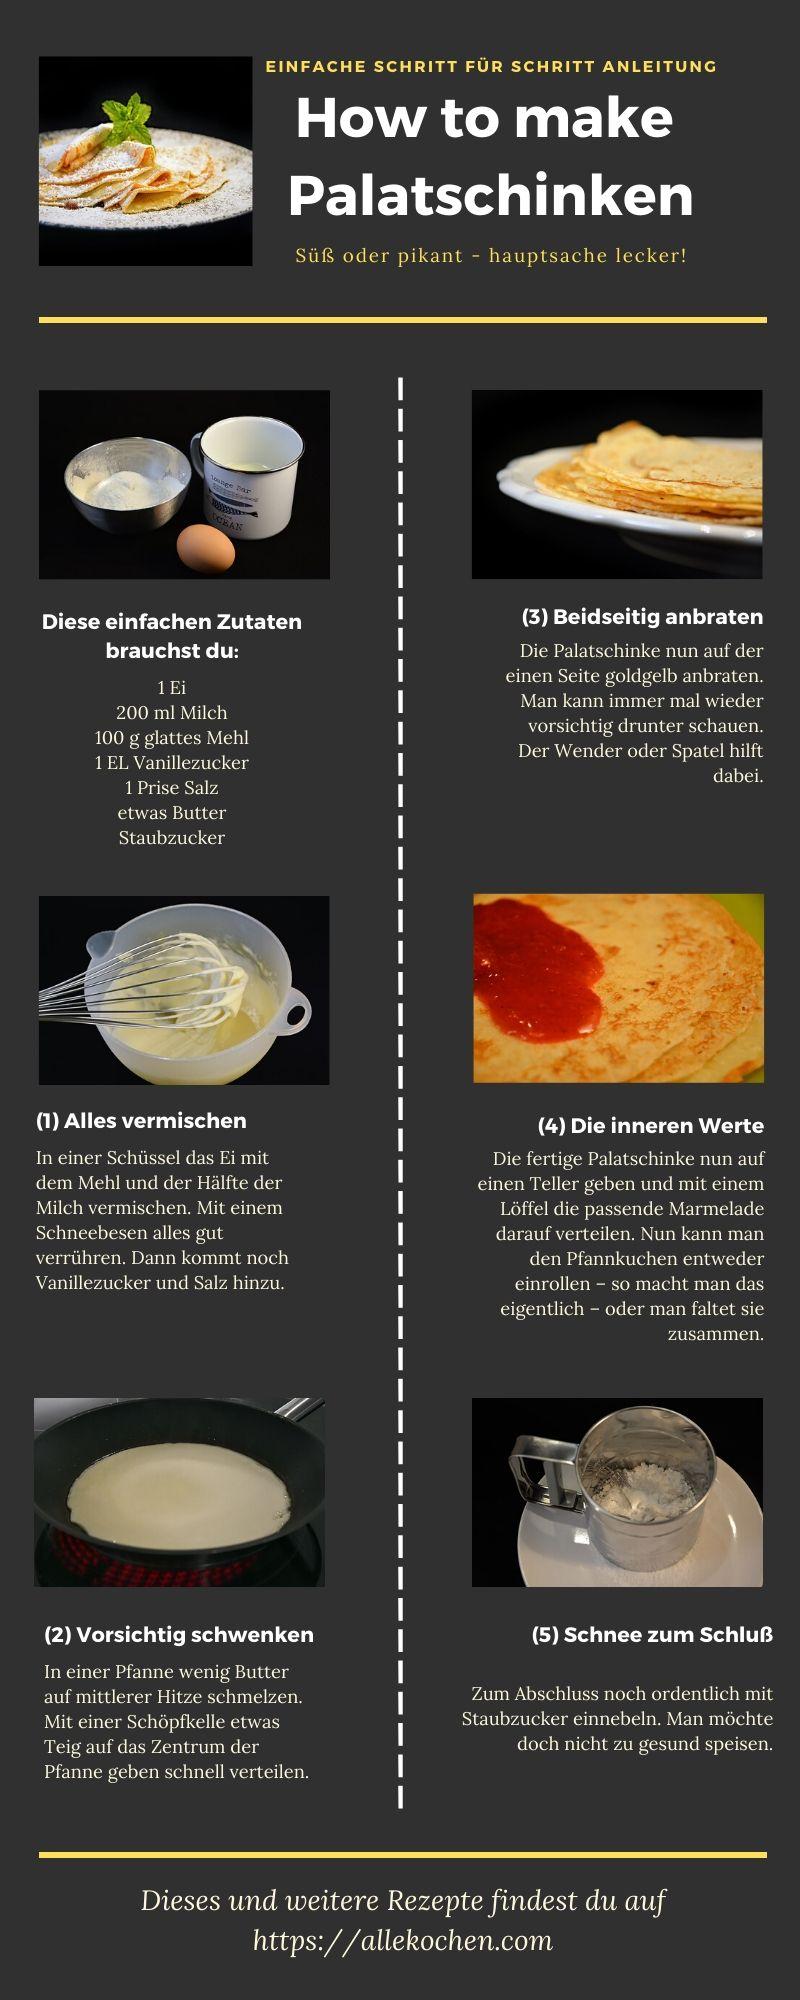 How to make Palatschinken. Eine einfache Schritt for Schritt Anleitung für Palatschinkenteig.